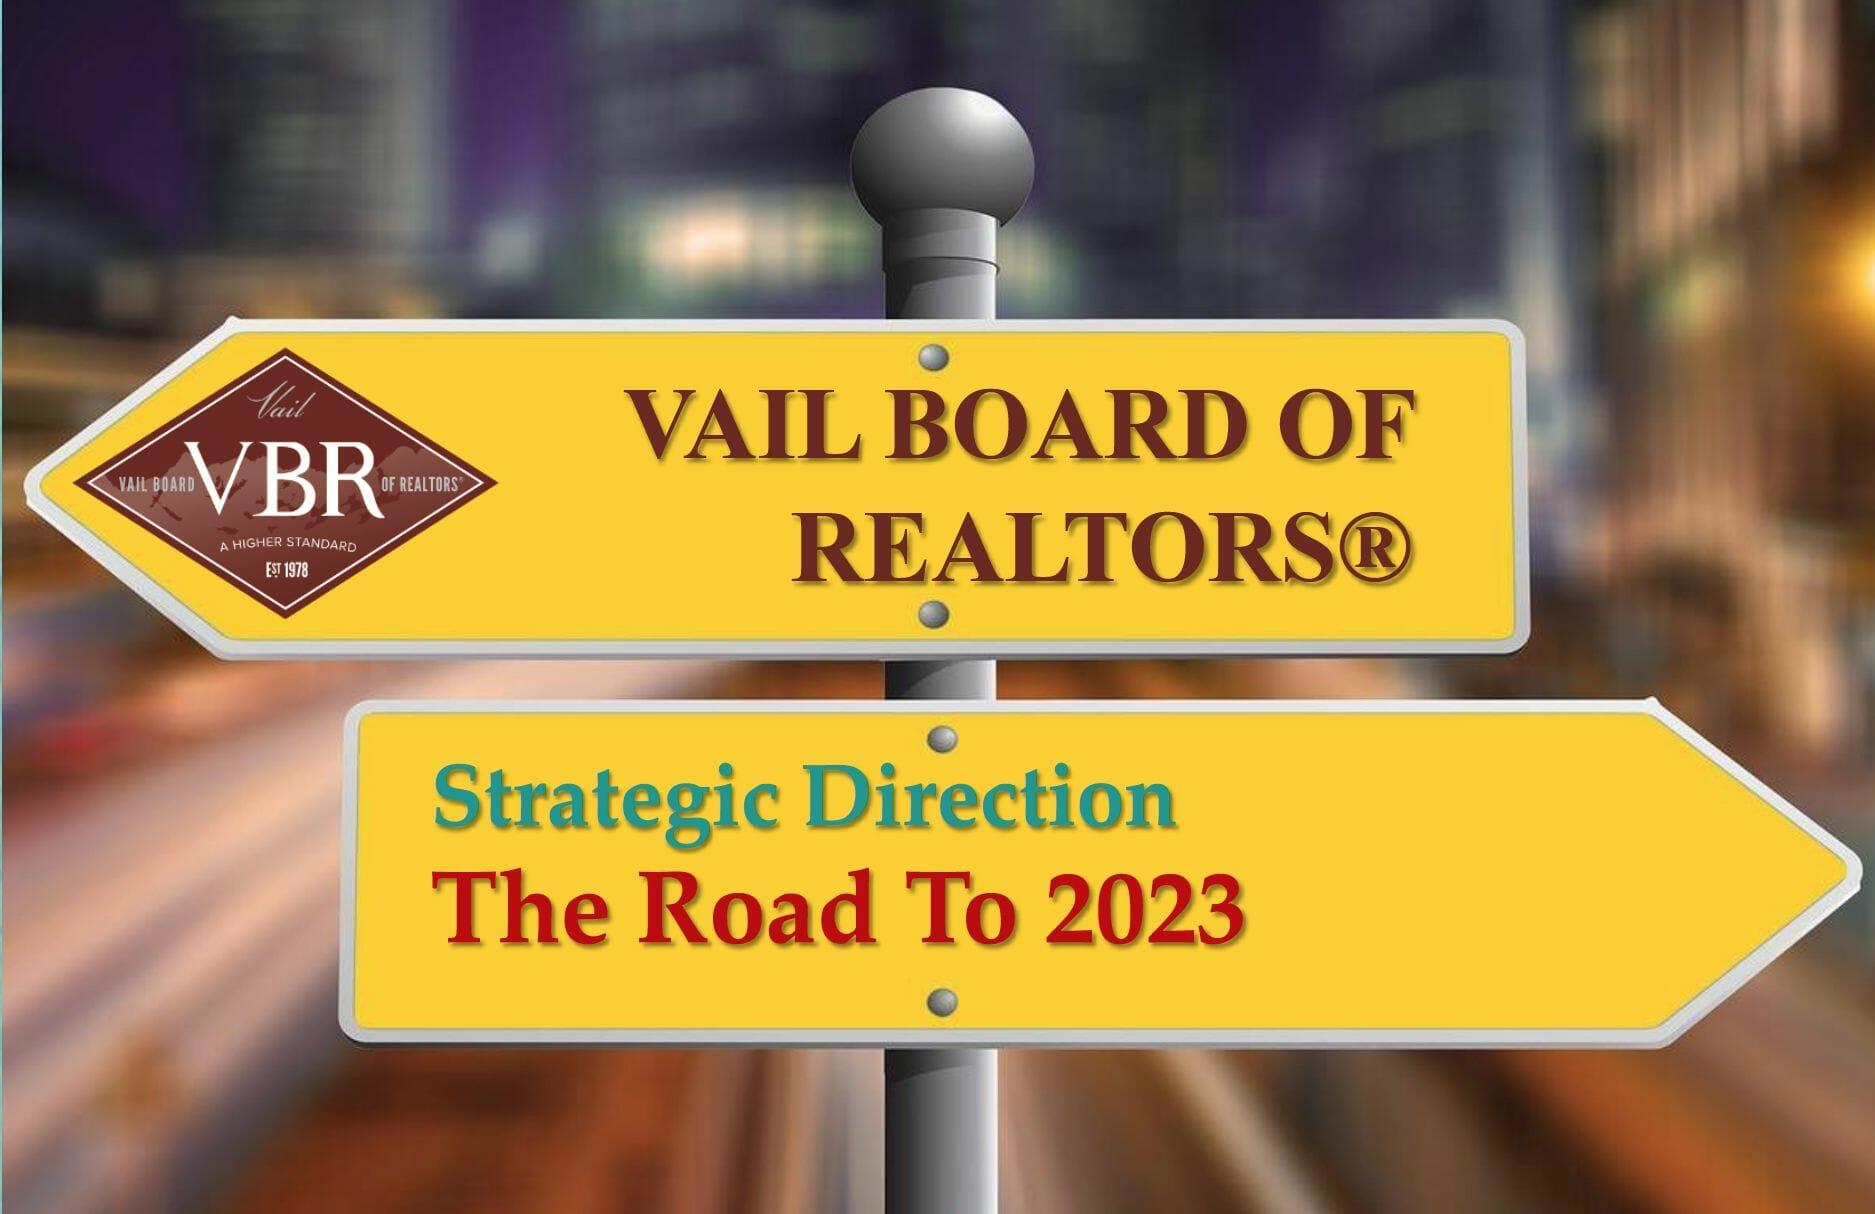 VBR Strat Plan image cropped